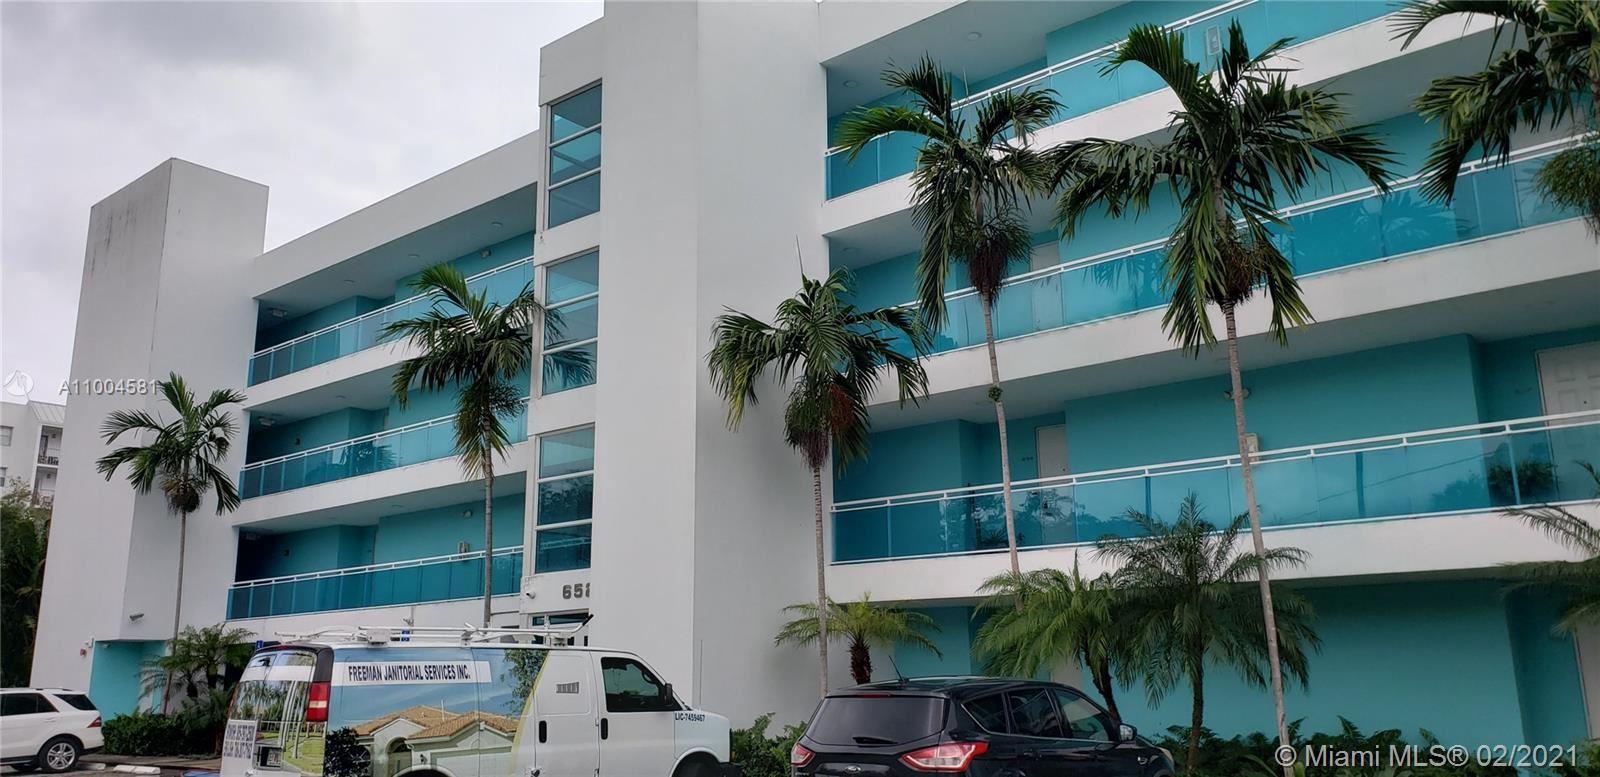 652 NE 63rd St #205, Miami, FL 33138 - #: A11004581